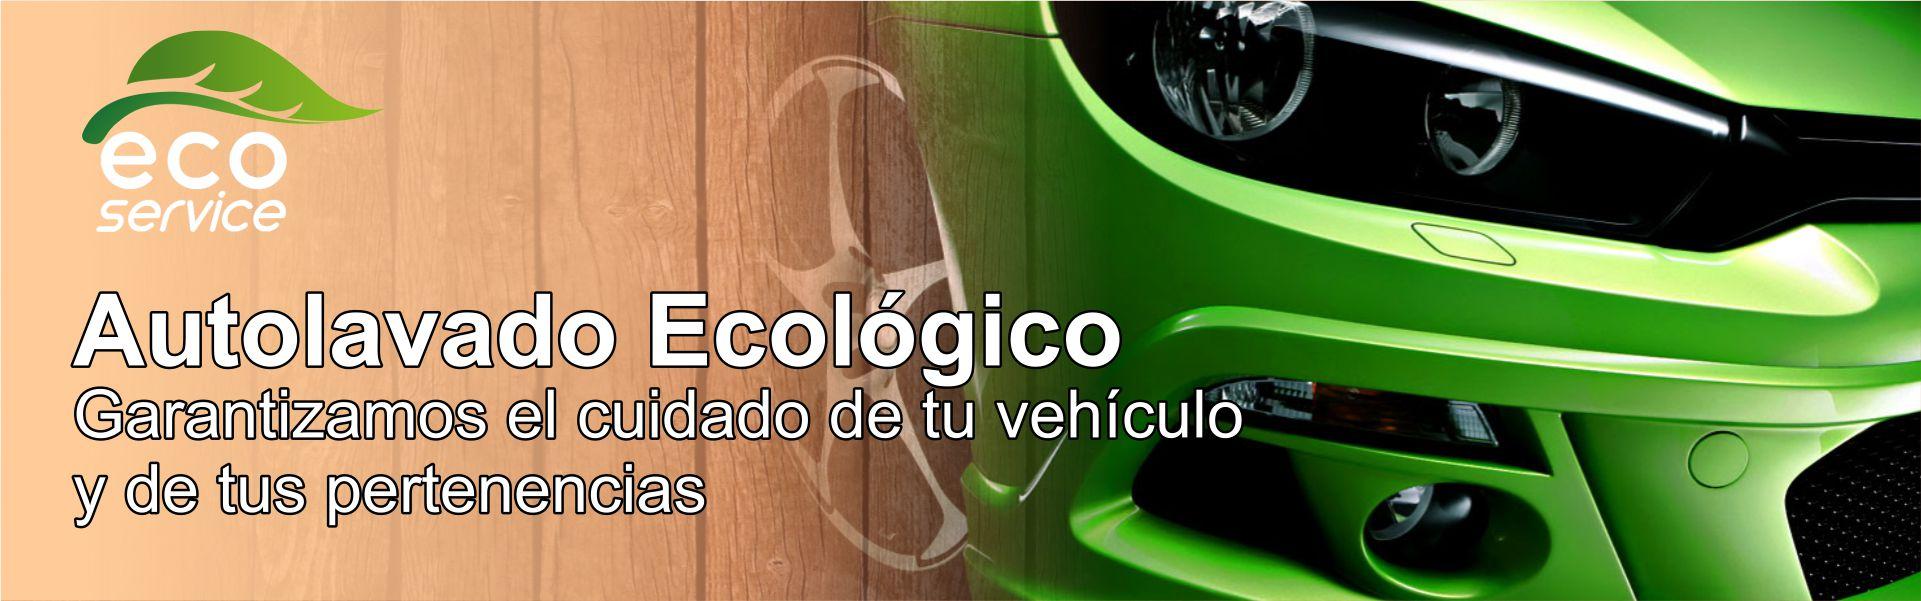 Ecoservi autolavado 2